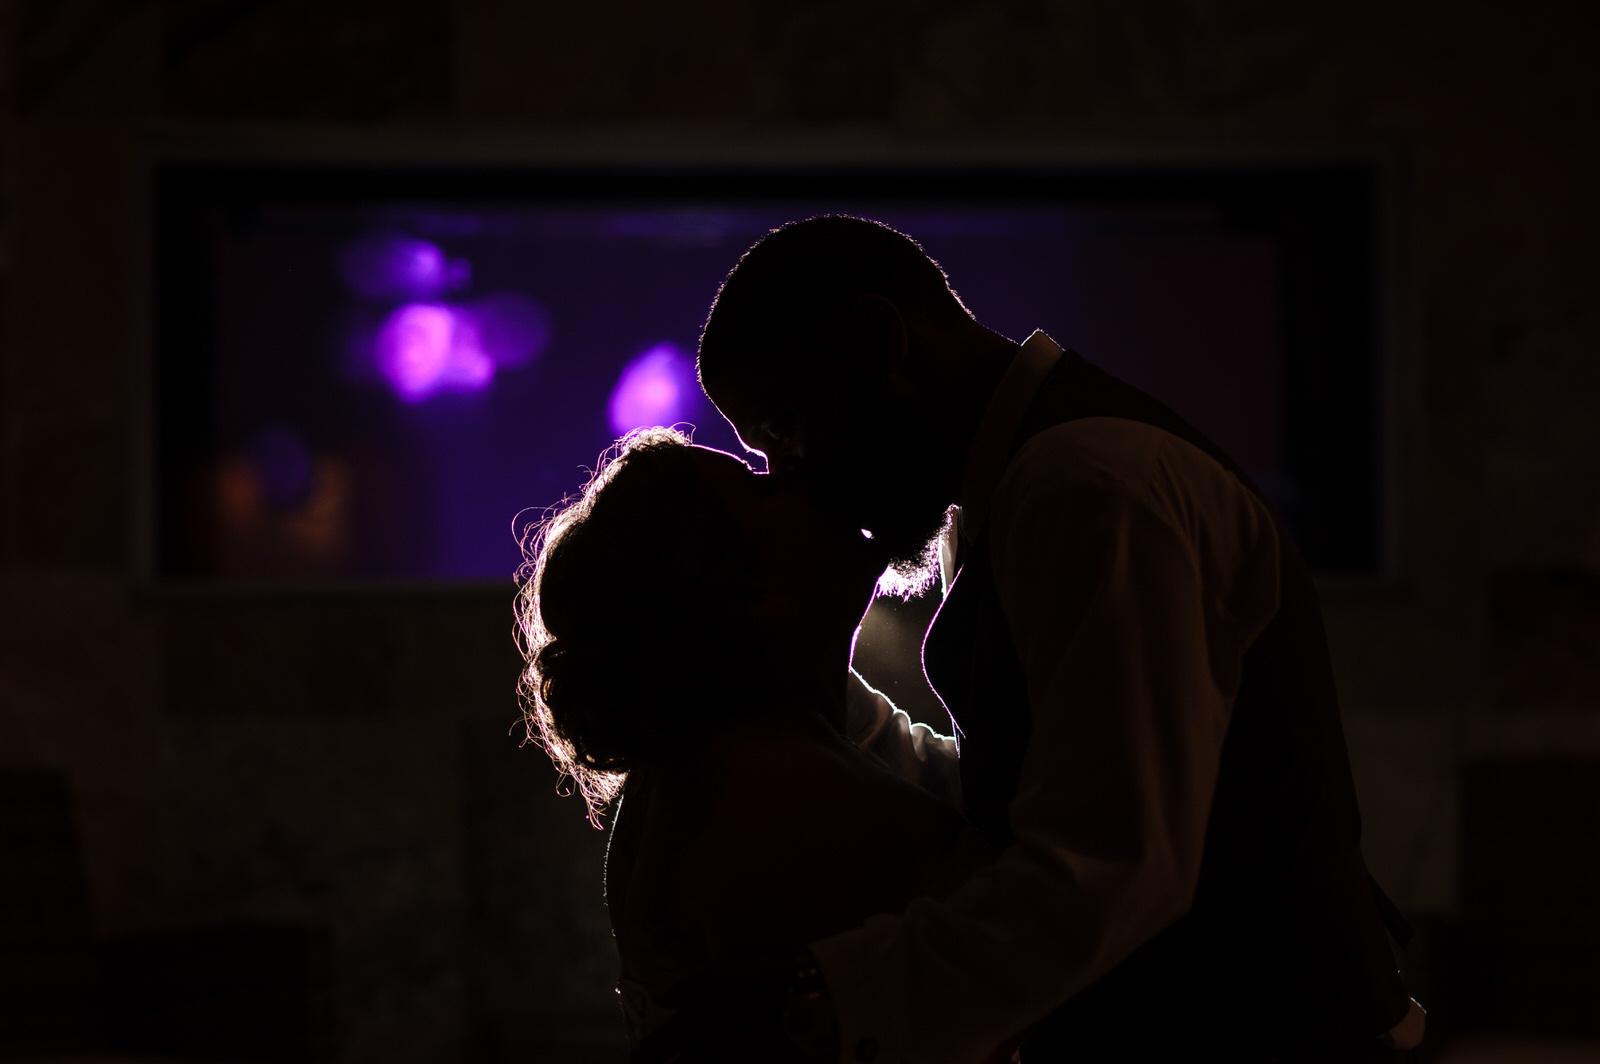 night-portrait-wedding-couple-intimate-kiss-tiny-house-photo.jpg